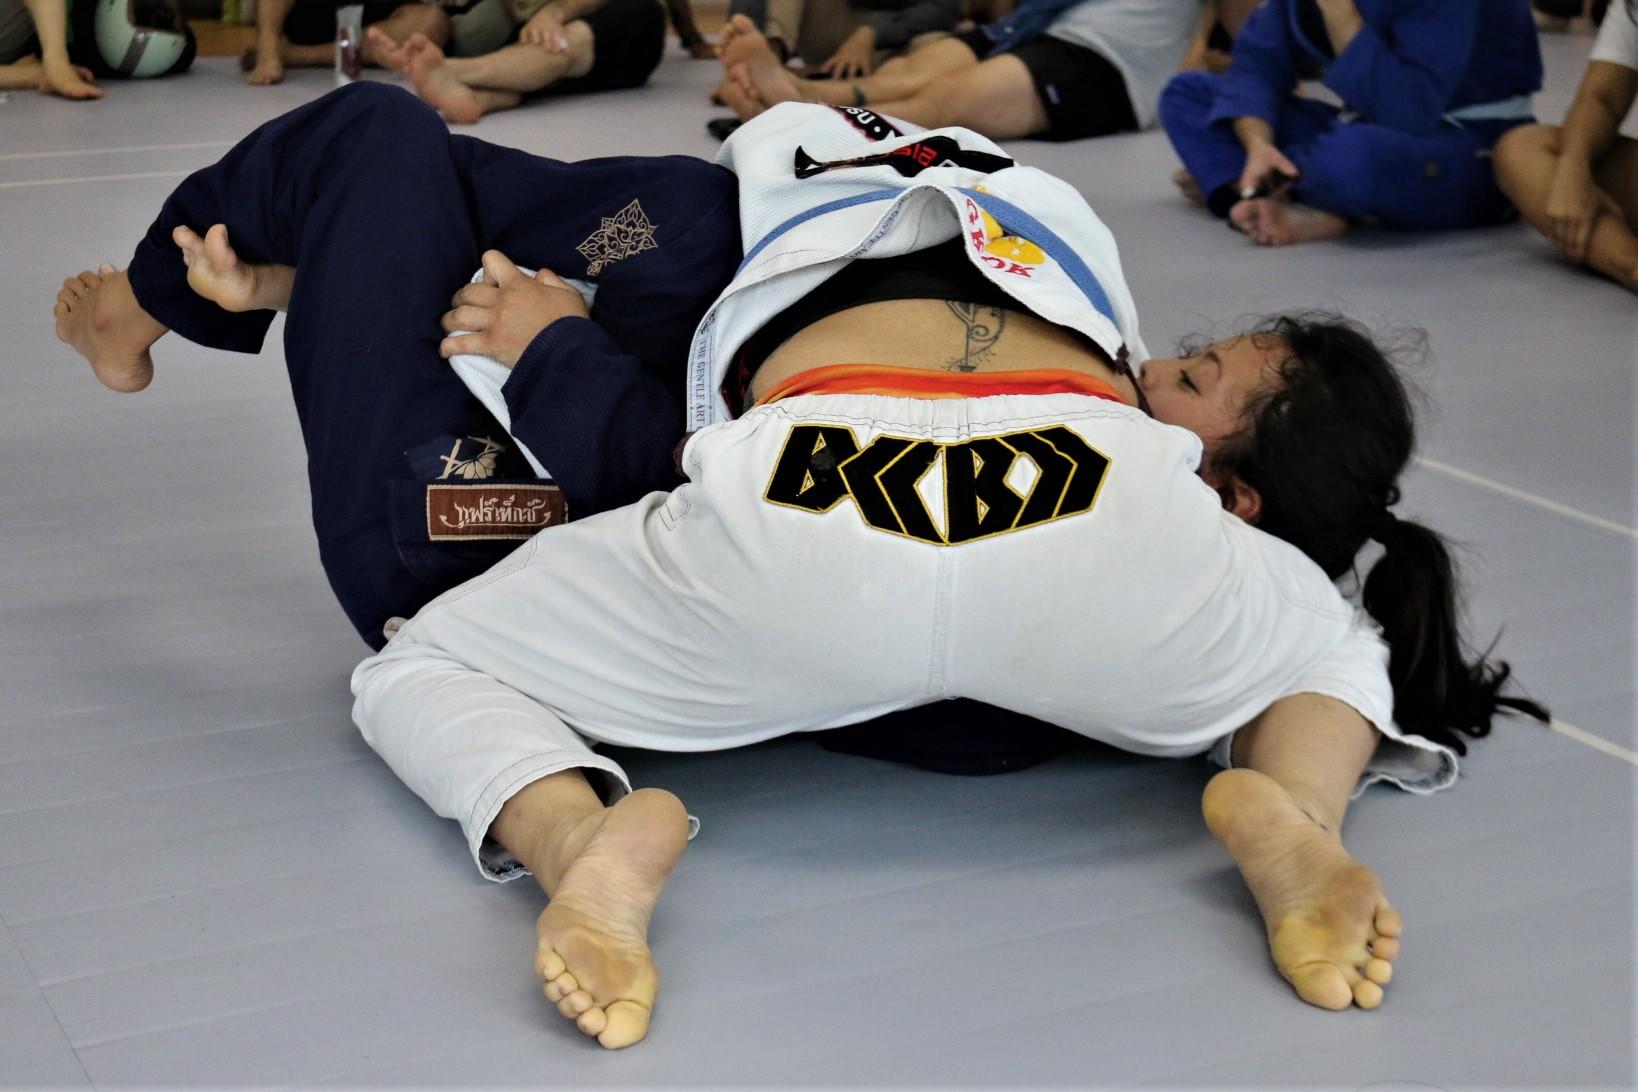 Bangkok BJJ competition